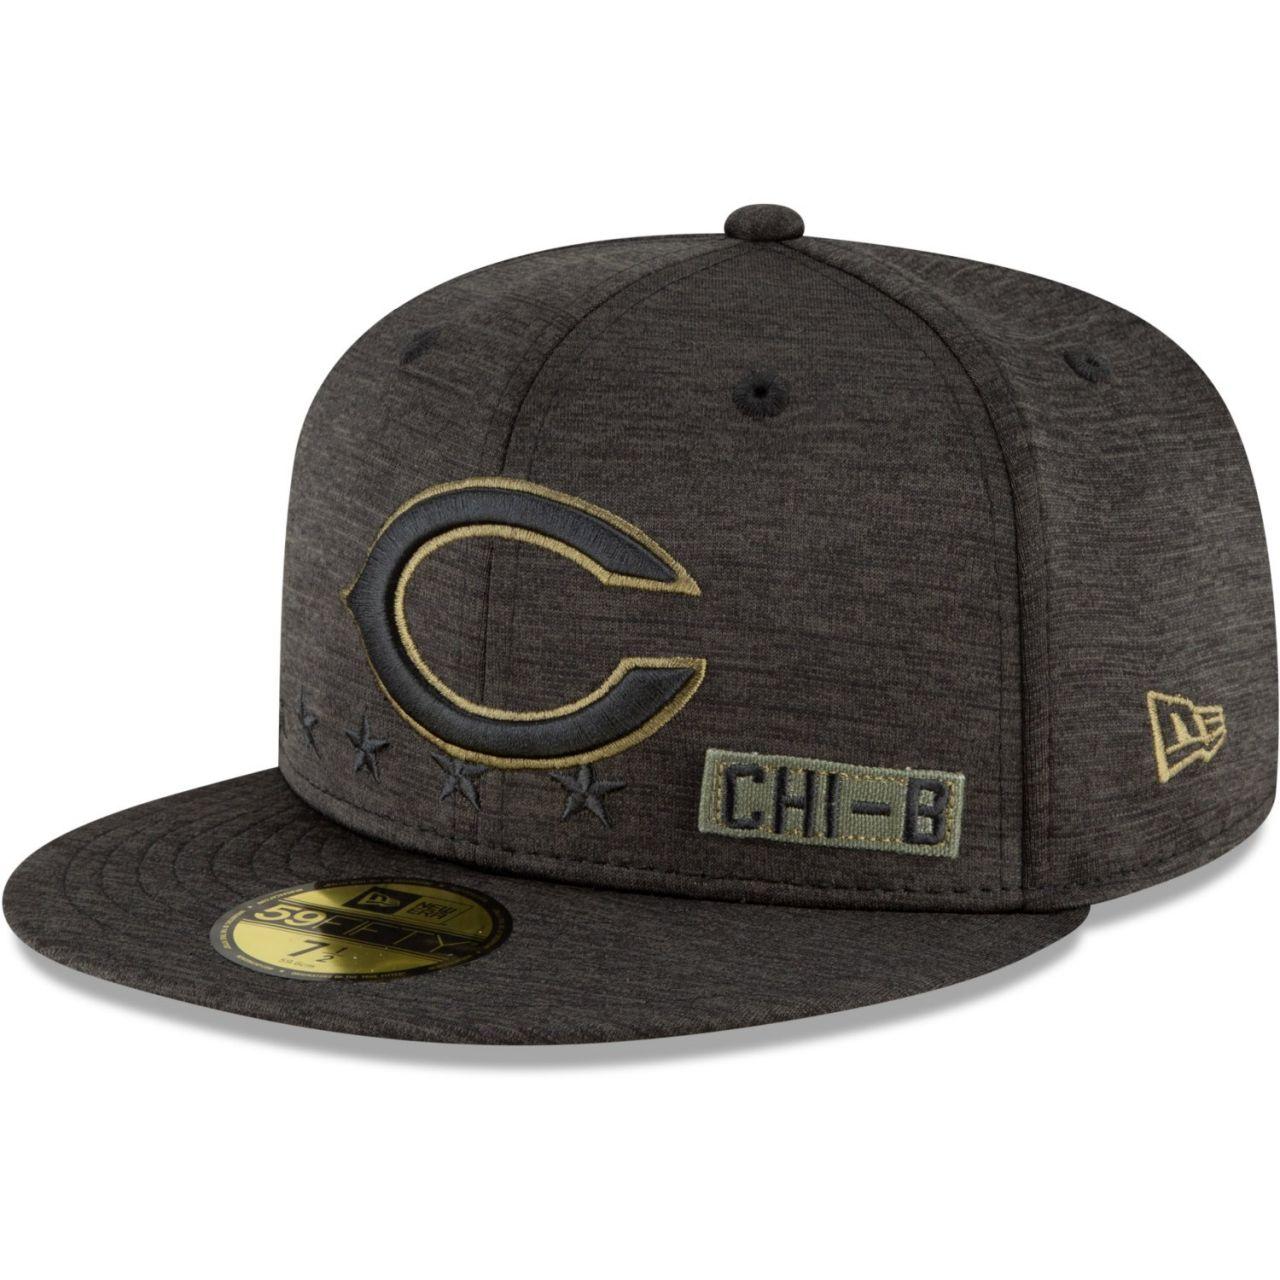 amfoo - New Era 59FIFTY Cap Salute to Service NFL Chicago Bears C